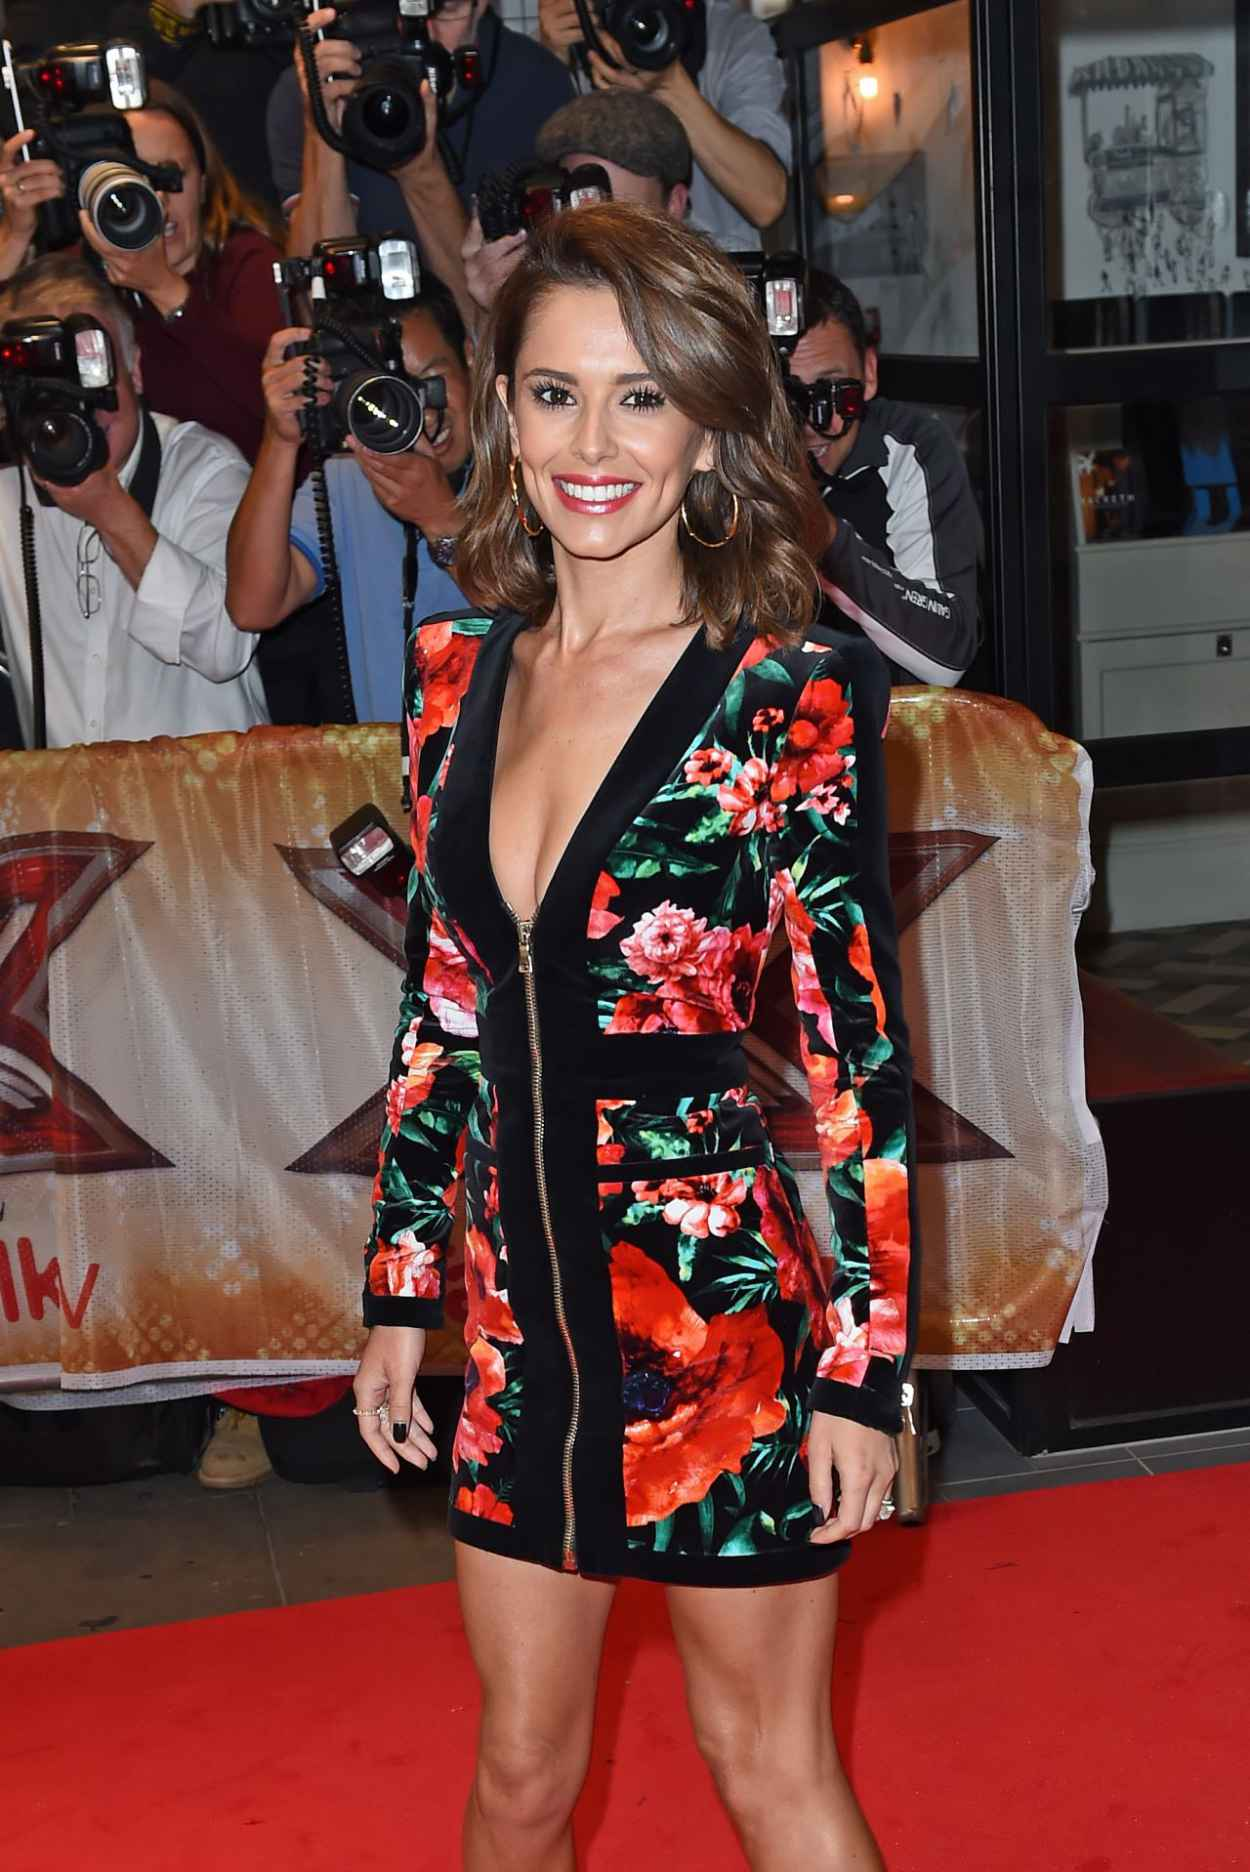 Cheryl Fernandez-Versini - The X-Factor Press Launch in London, August 2015-3